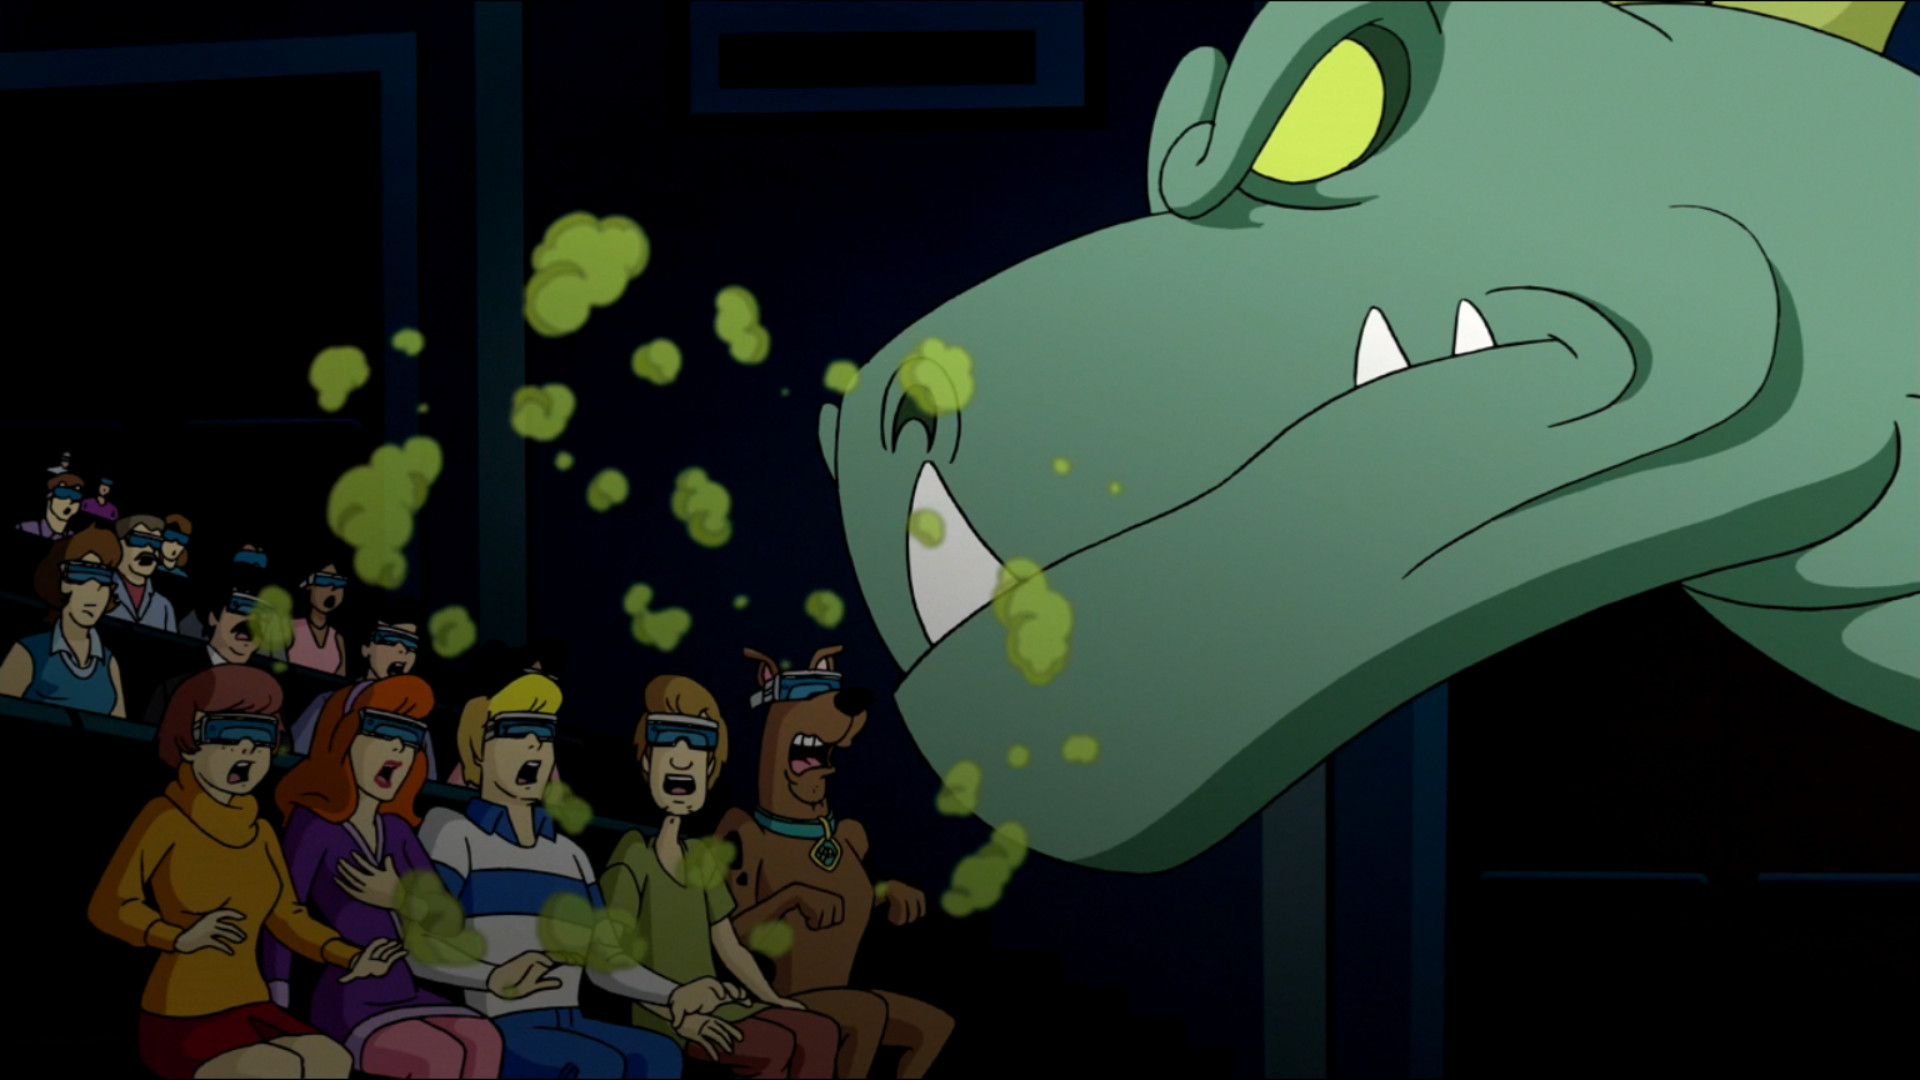 Monster Inc Wallpaper Iphone 6 Scooby Doo Backgrounds 66 Images